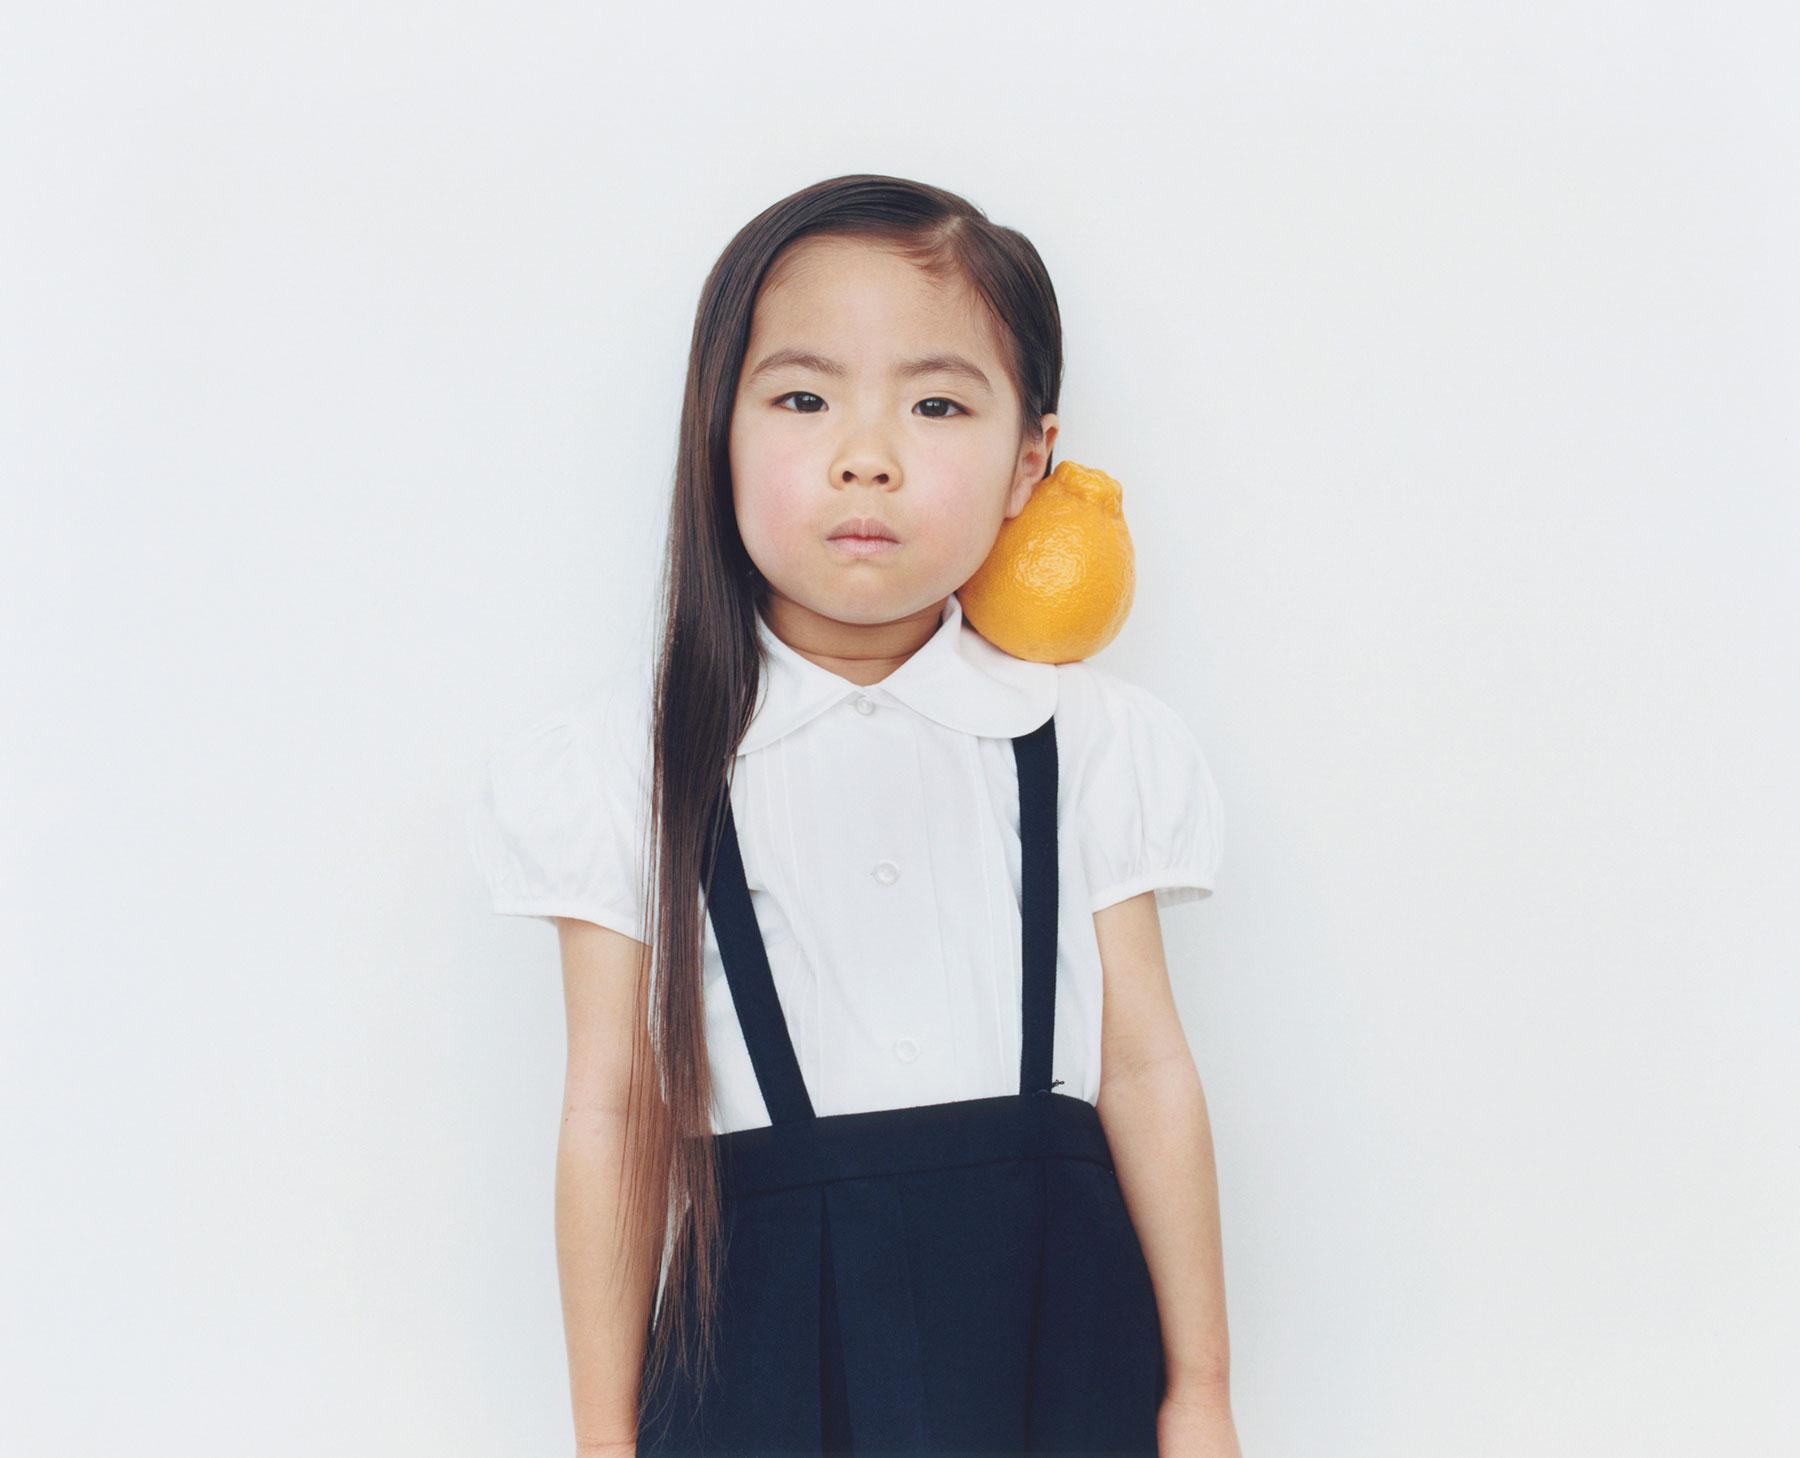 Osamu Yokonami,  1000 Children: Sumo Mandarin No. 2 , 2010-2013  Digital pigment print, 895 x 1105 mm (approx. 34.25 x 43.5 in), edition of 5; 146 x 168 mm (approx. 5.75 x 6.6 in), edition of 10   Inquire